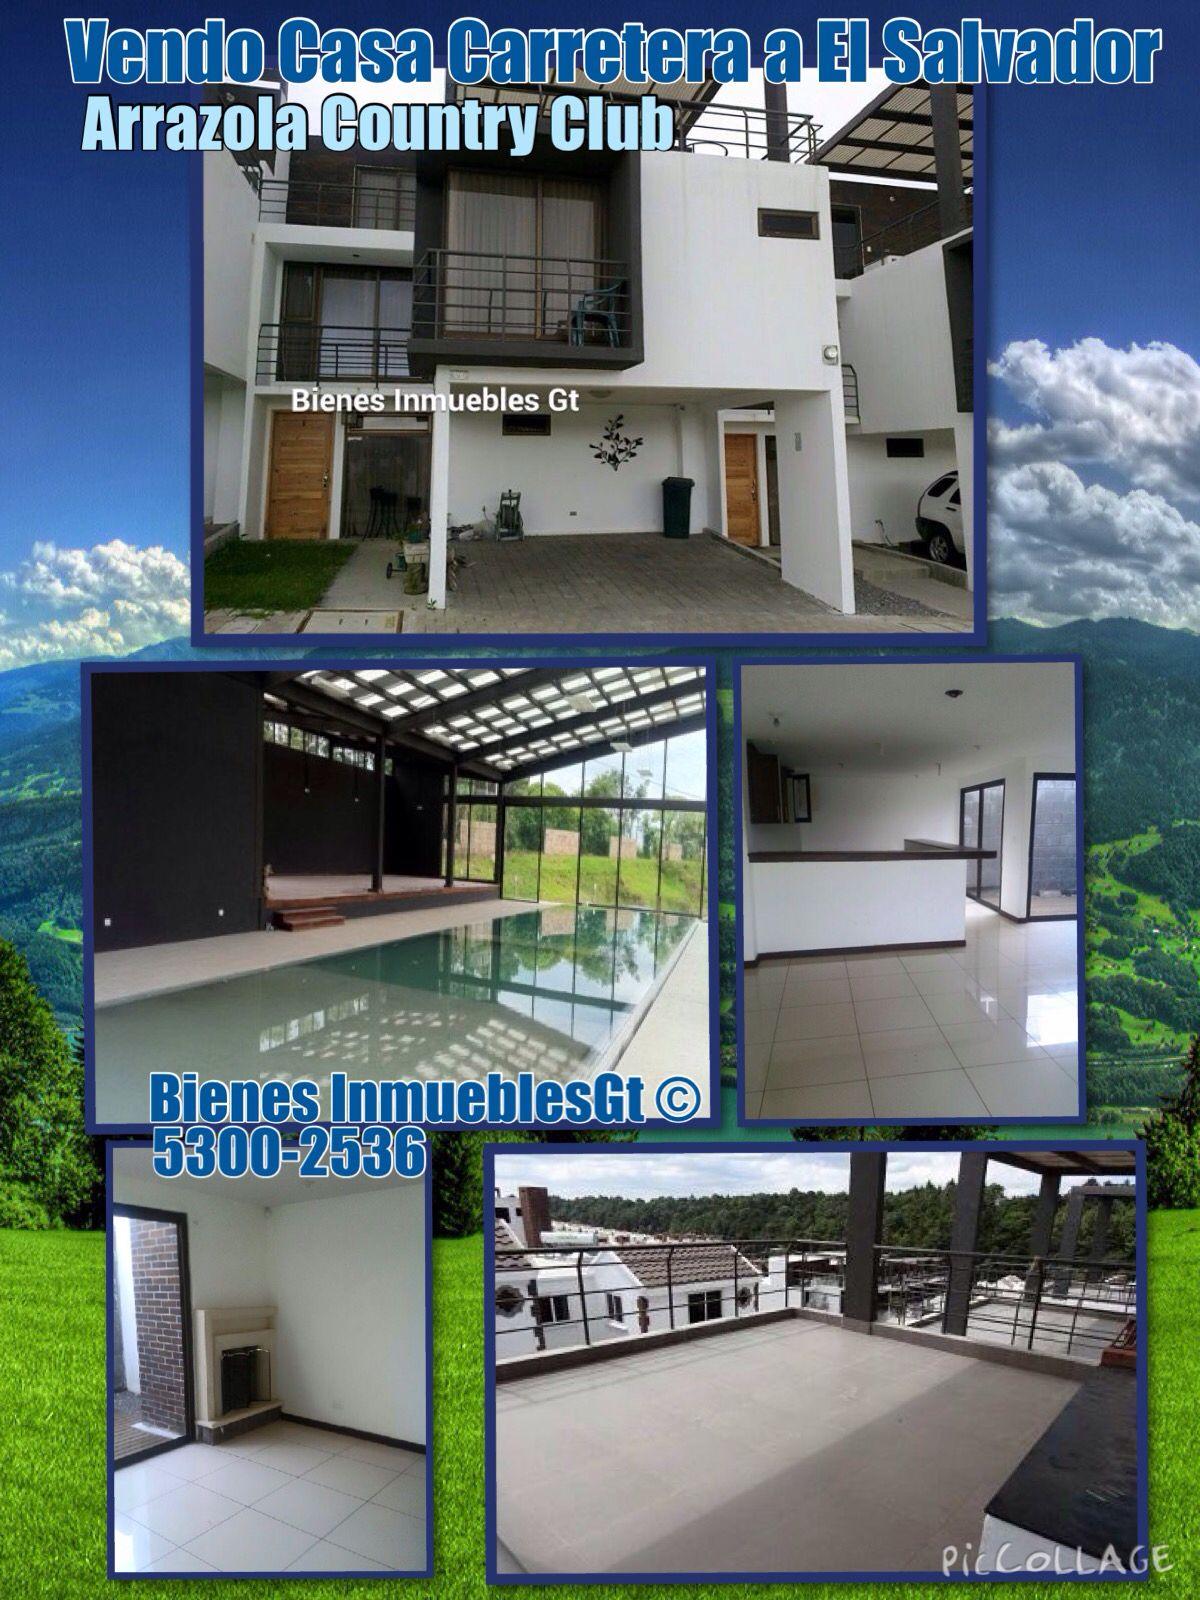 Vendo Casa Carretera a El Salvador Arrazola Country Club 4